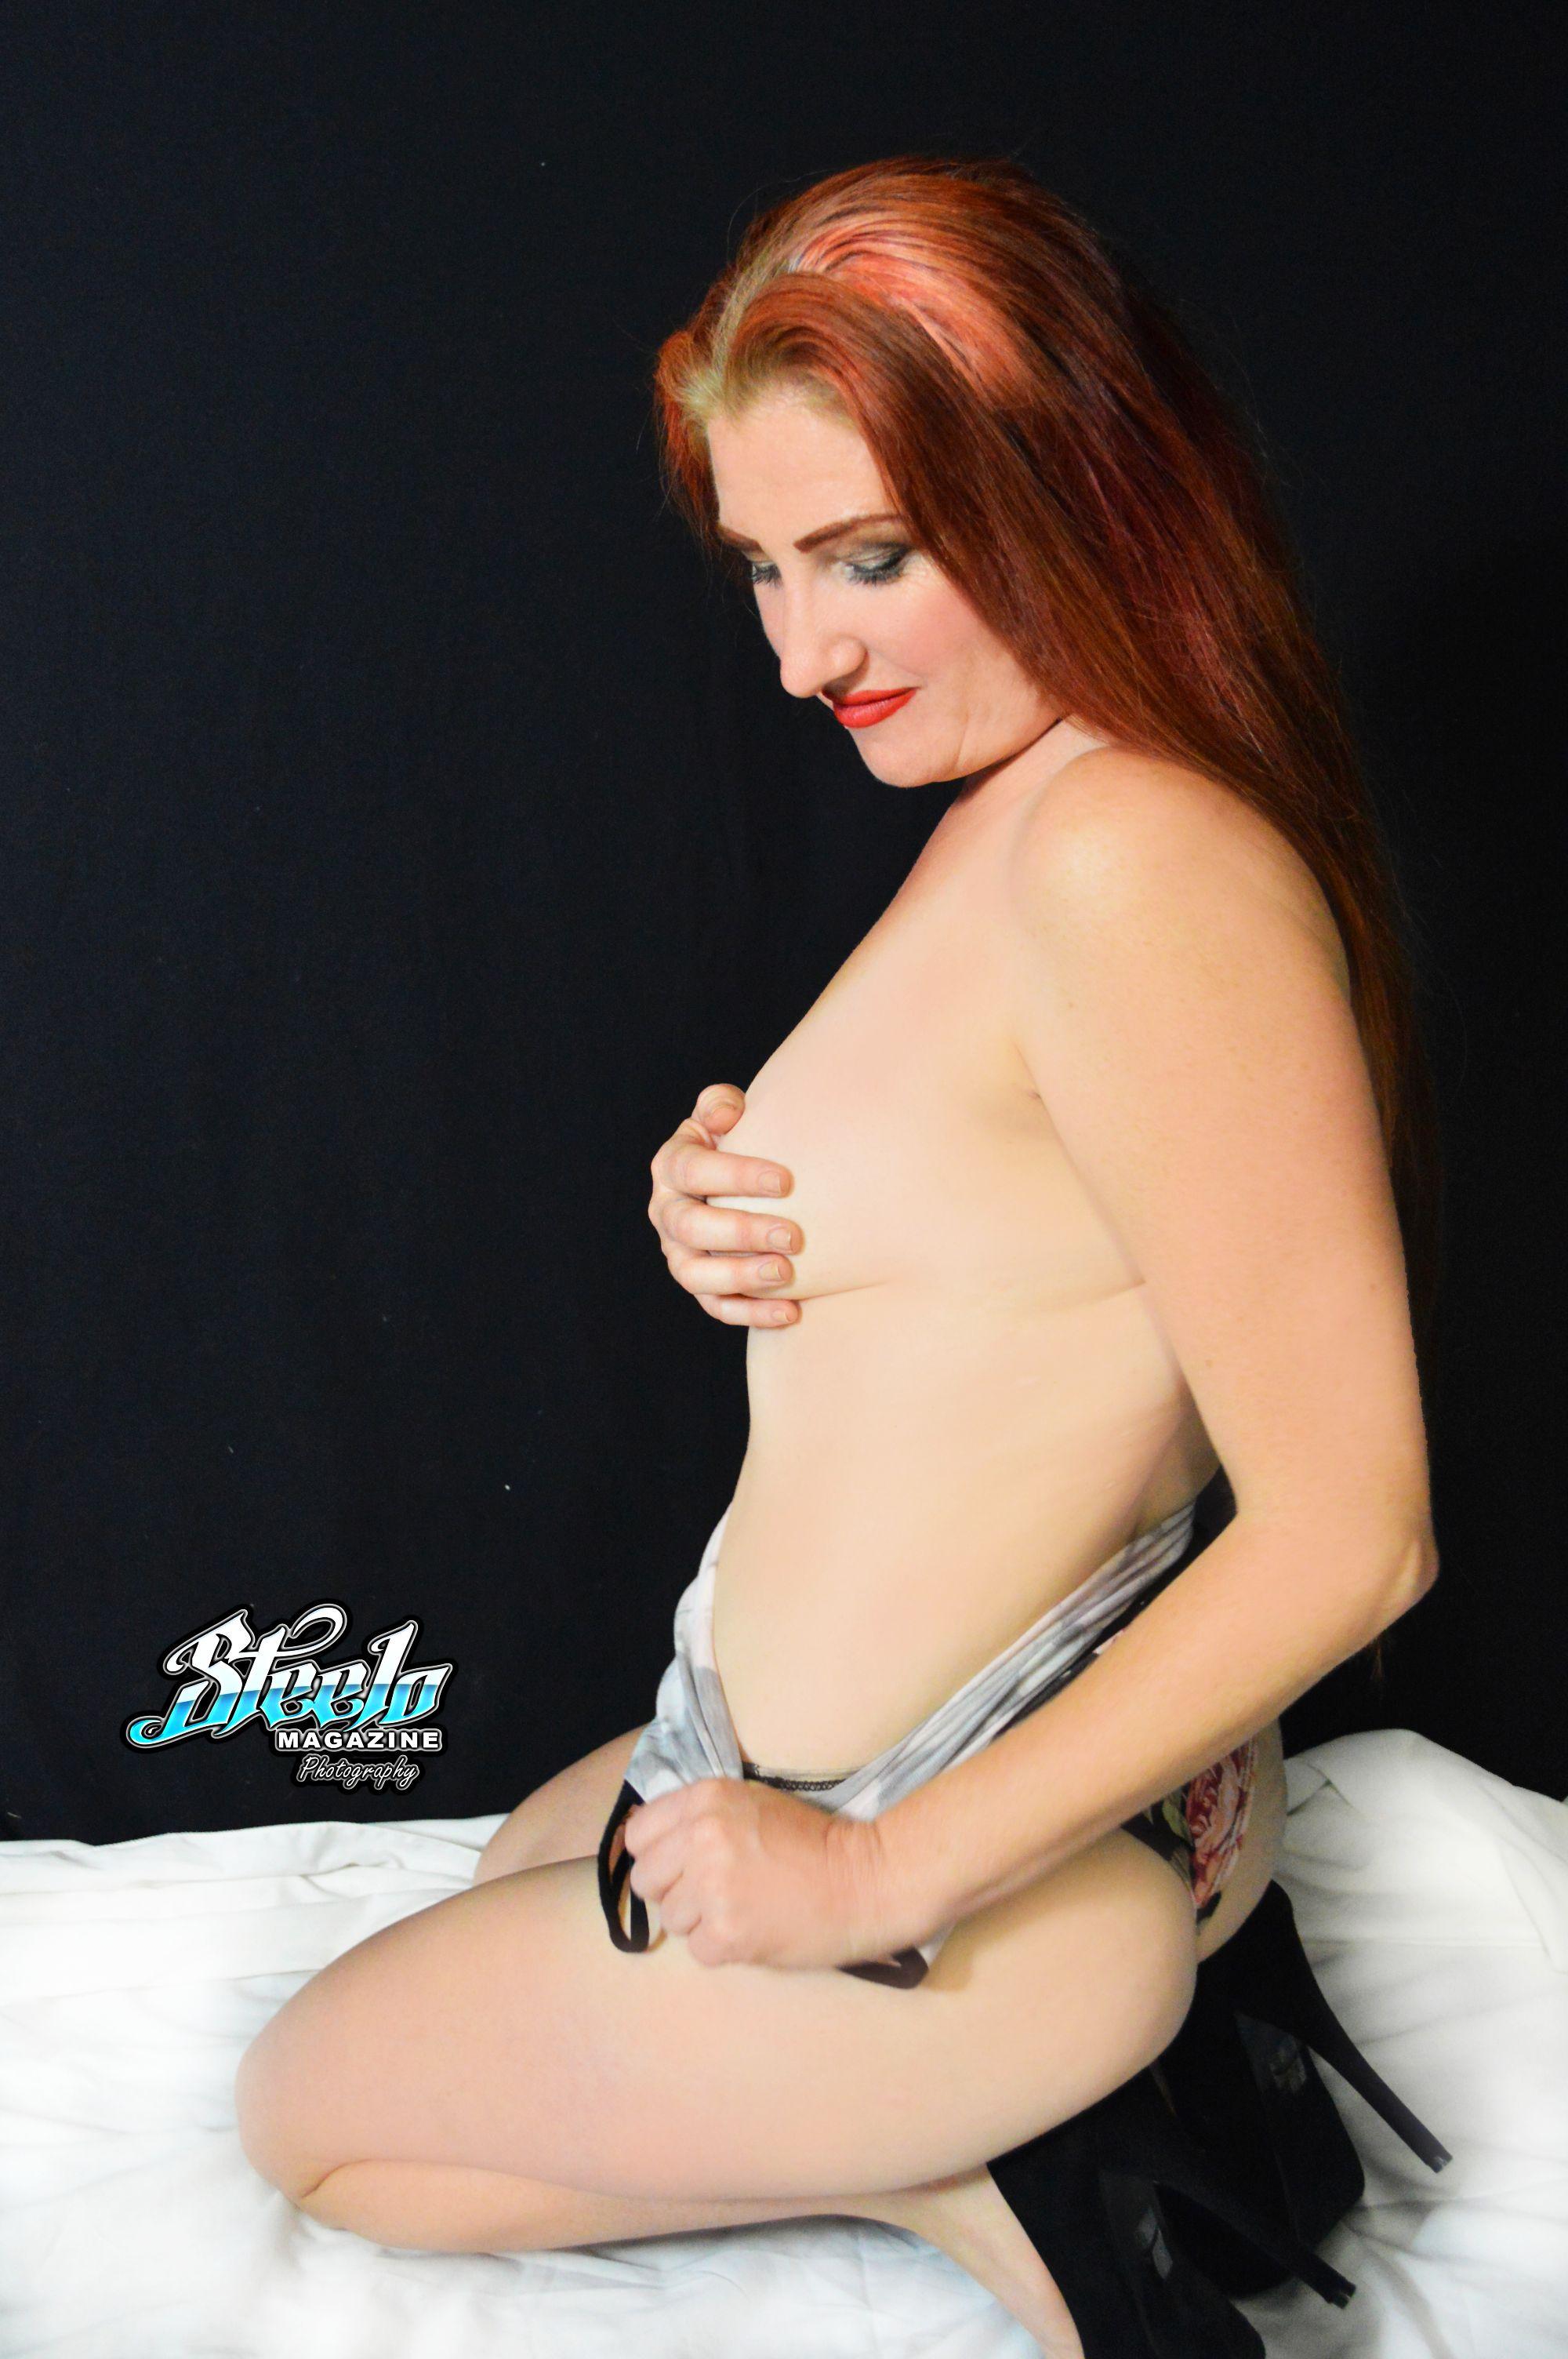 Creena 1st sexy photo shoot (65)